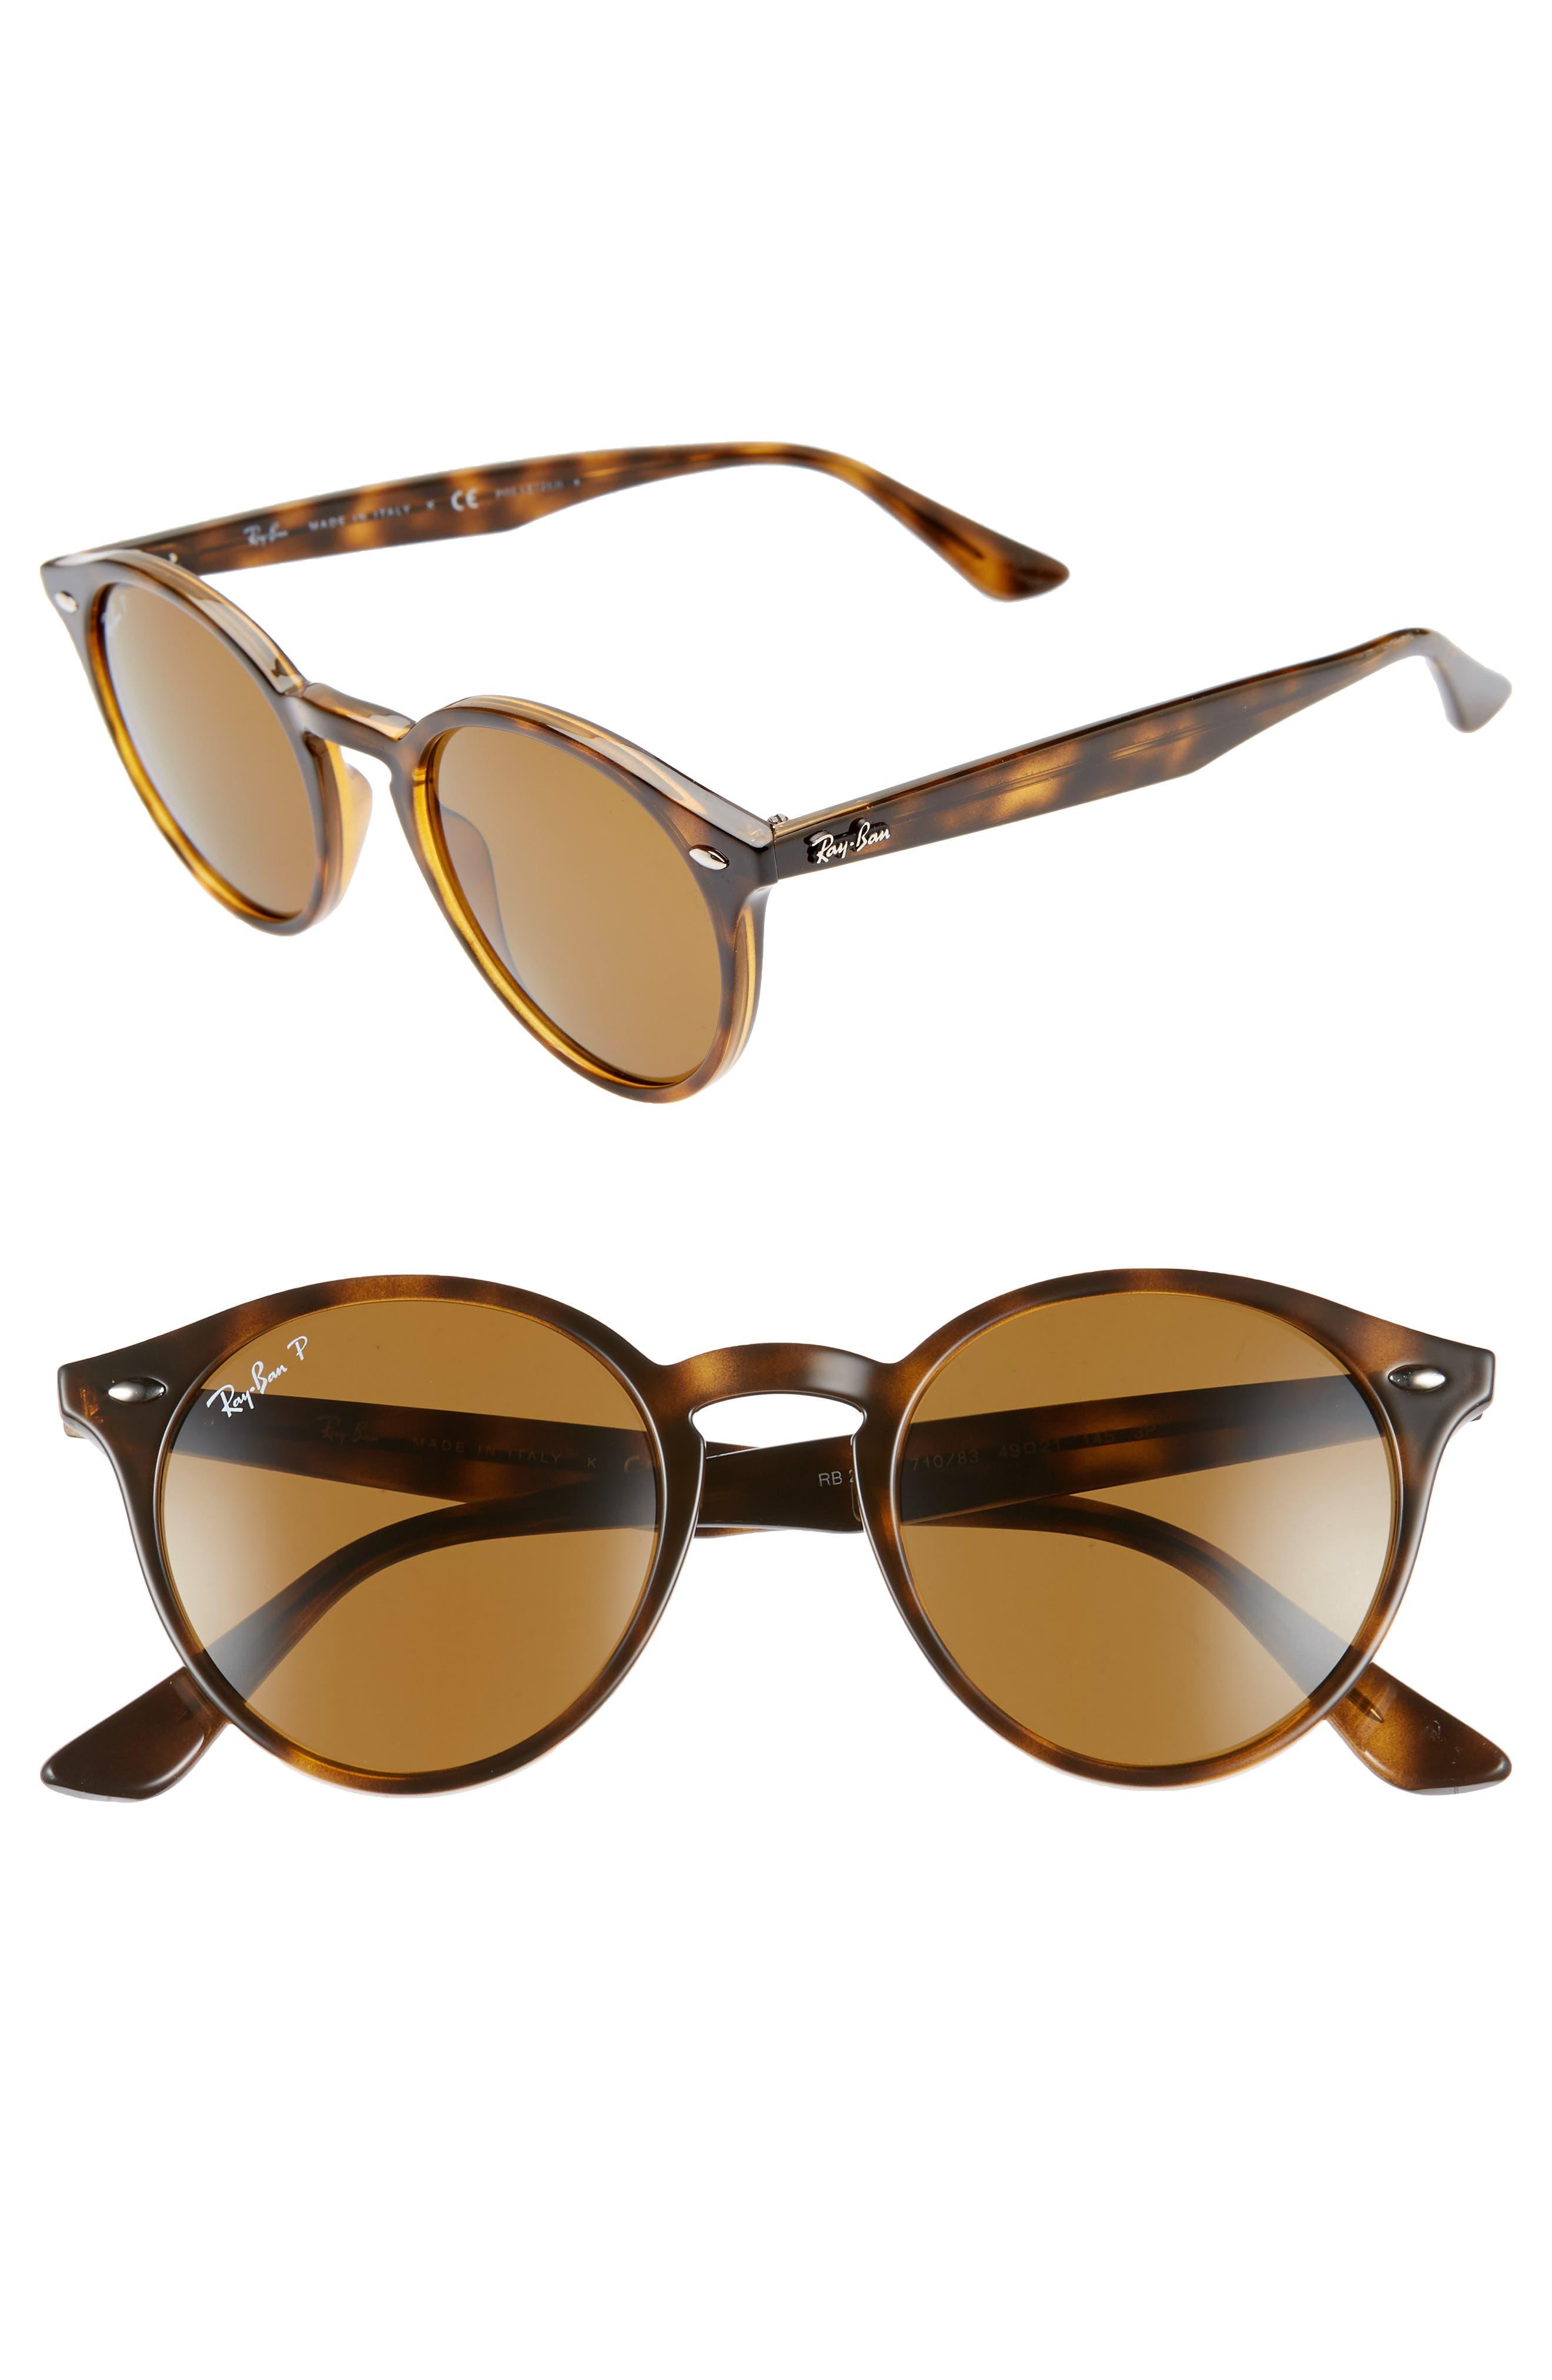 Ray-Ban 4m Polarized Round Sunglasses - Dark Havana Solid